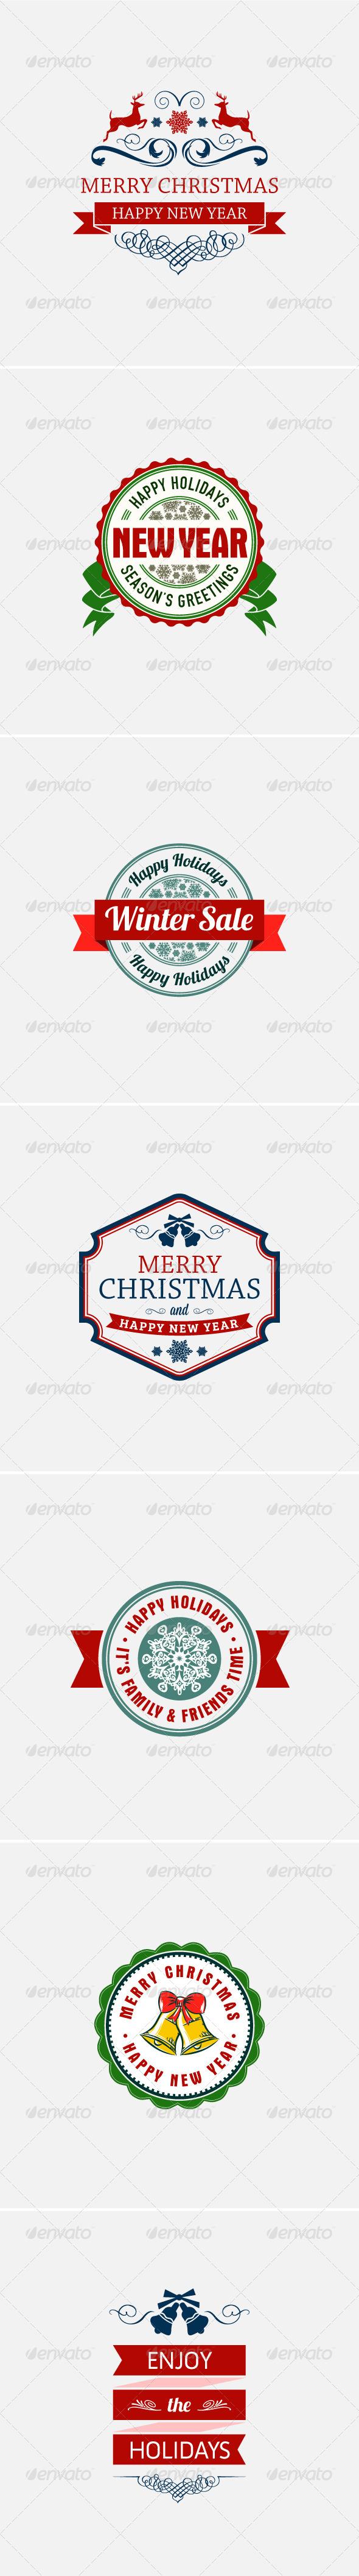 GraphicRiver 7 Christmas Holidays Themed Badges 6161896